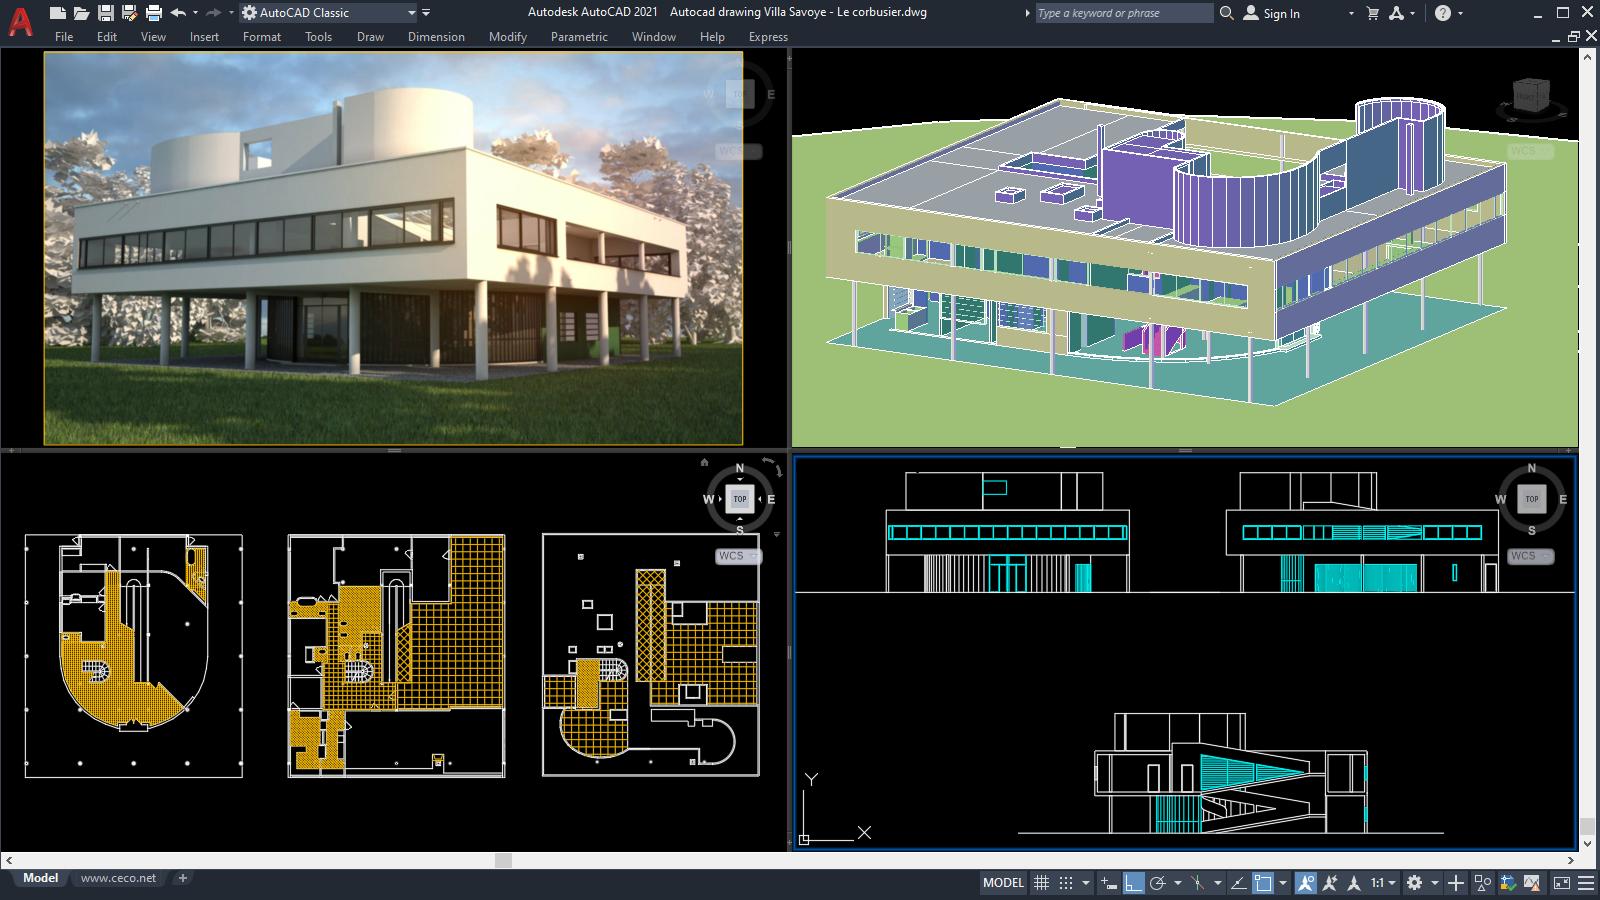 Villa Savoye - Le corbusier Plan 3D, 2D [DWG]